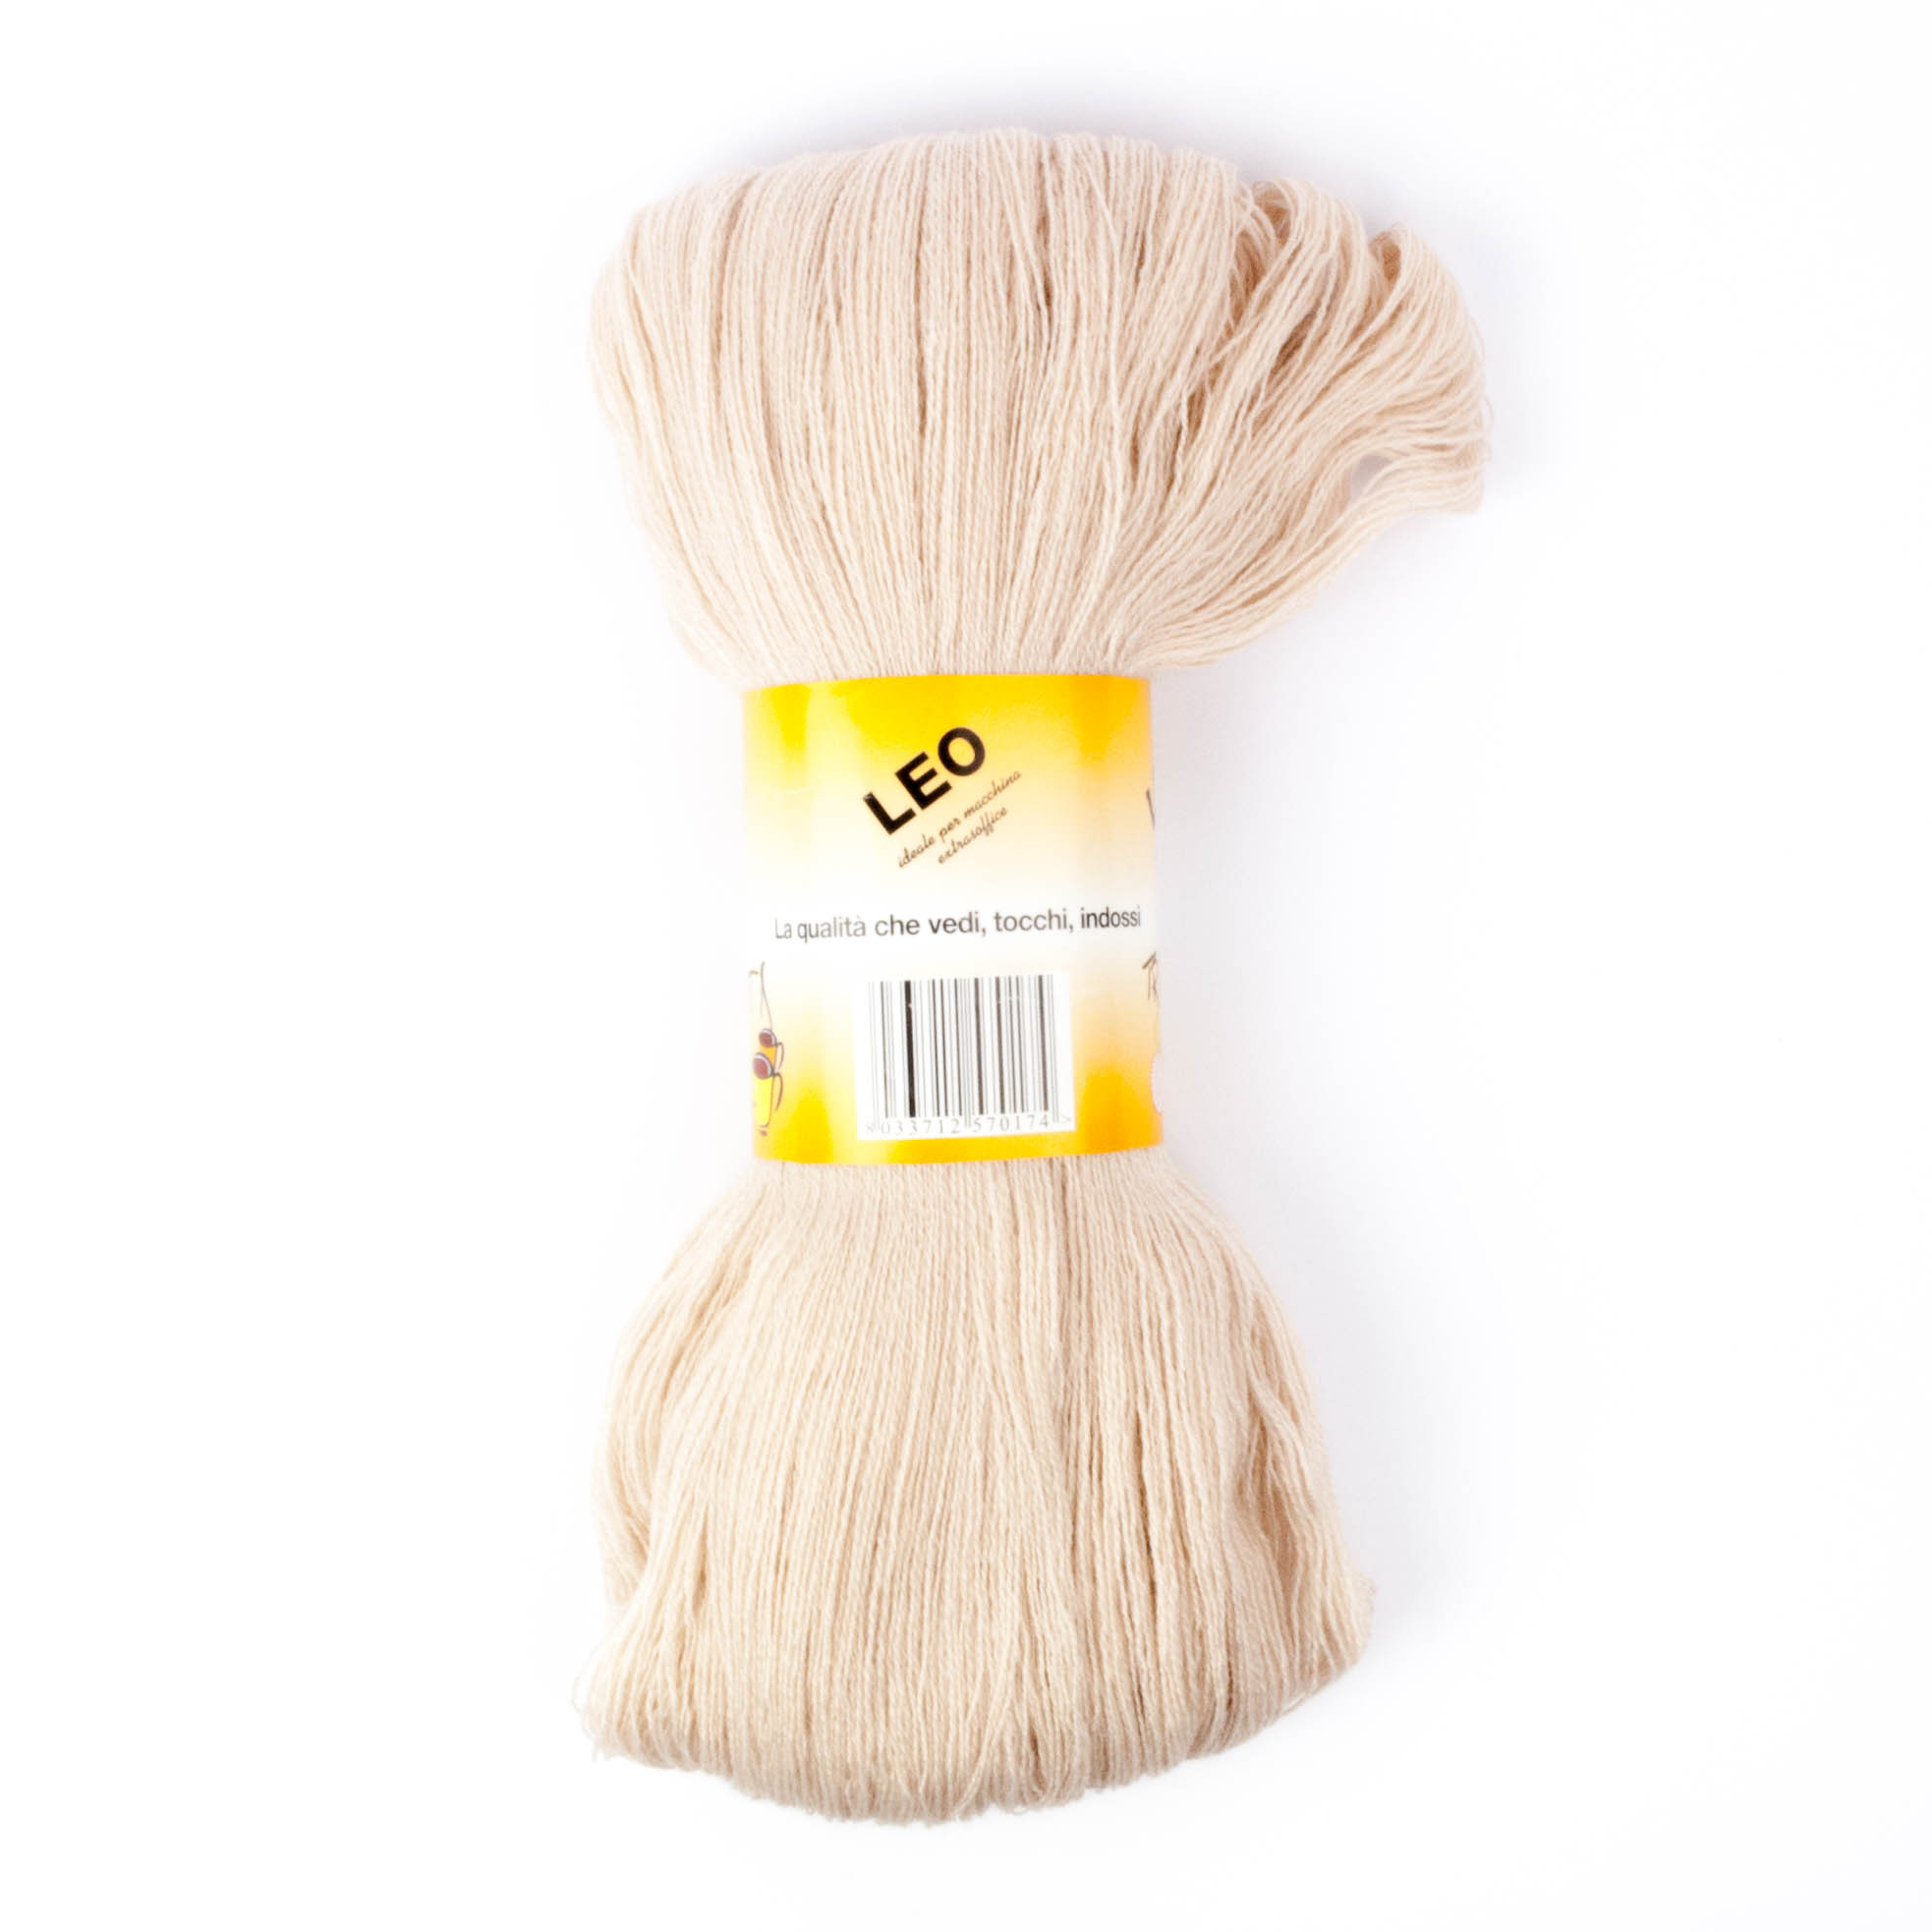 Leo - Matassa misto lana ideale per lavori a mano e macchina - Beige 4